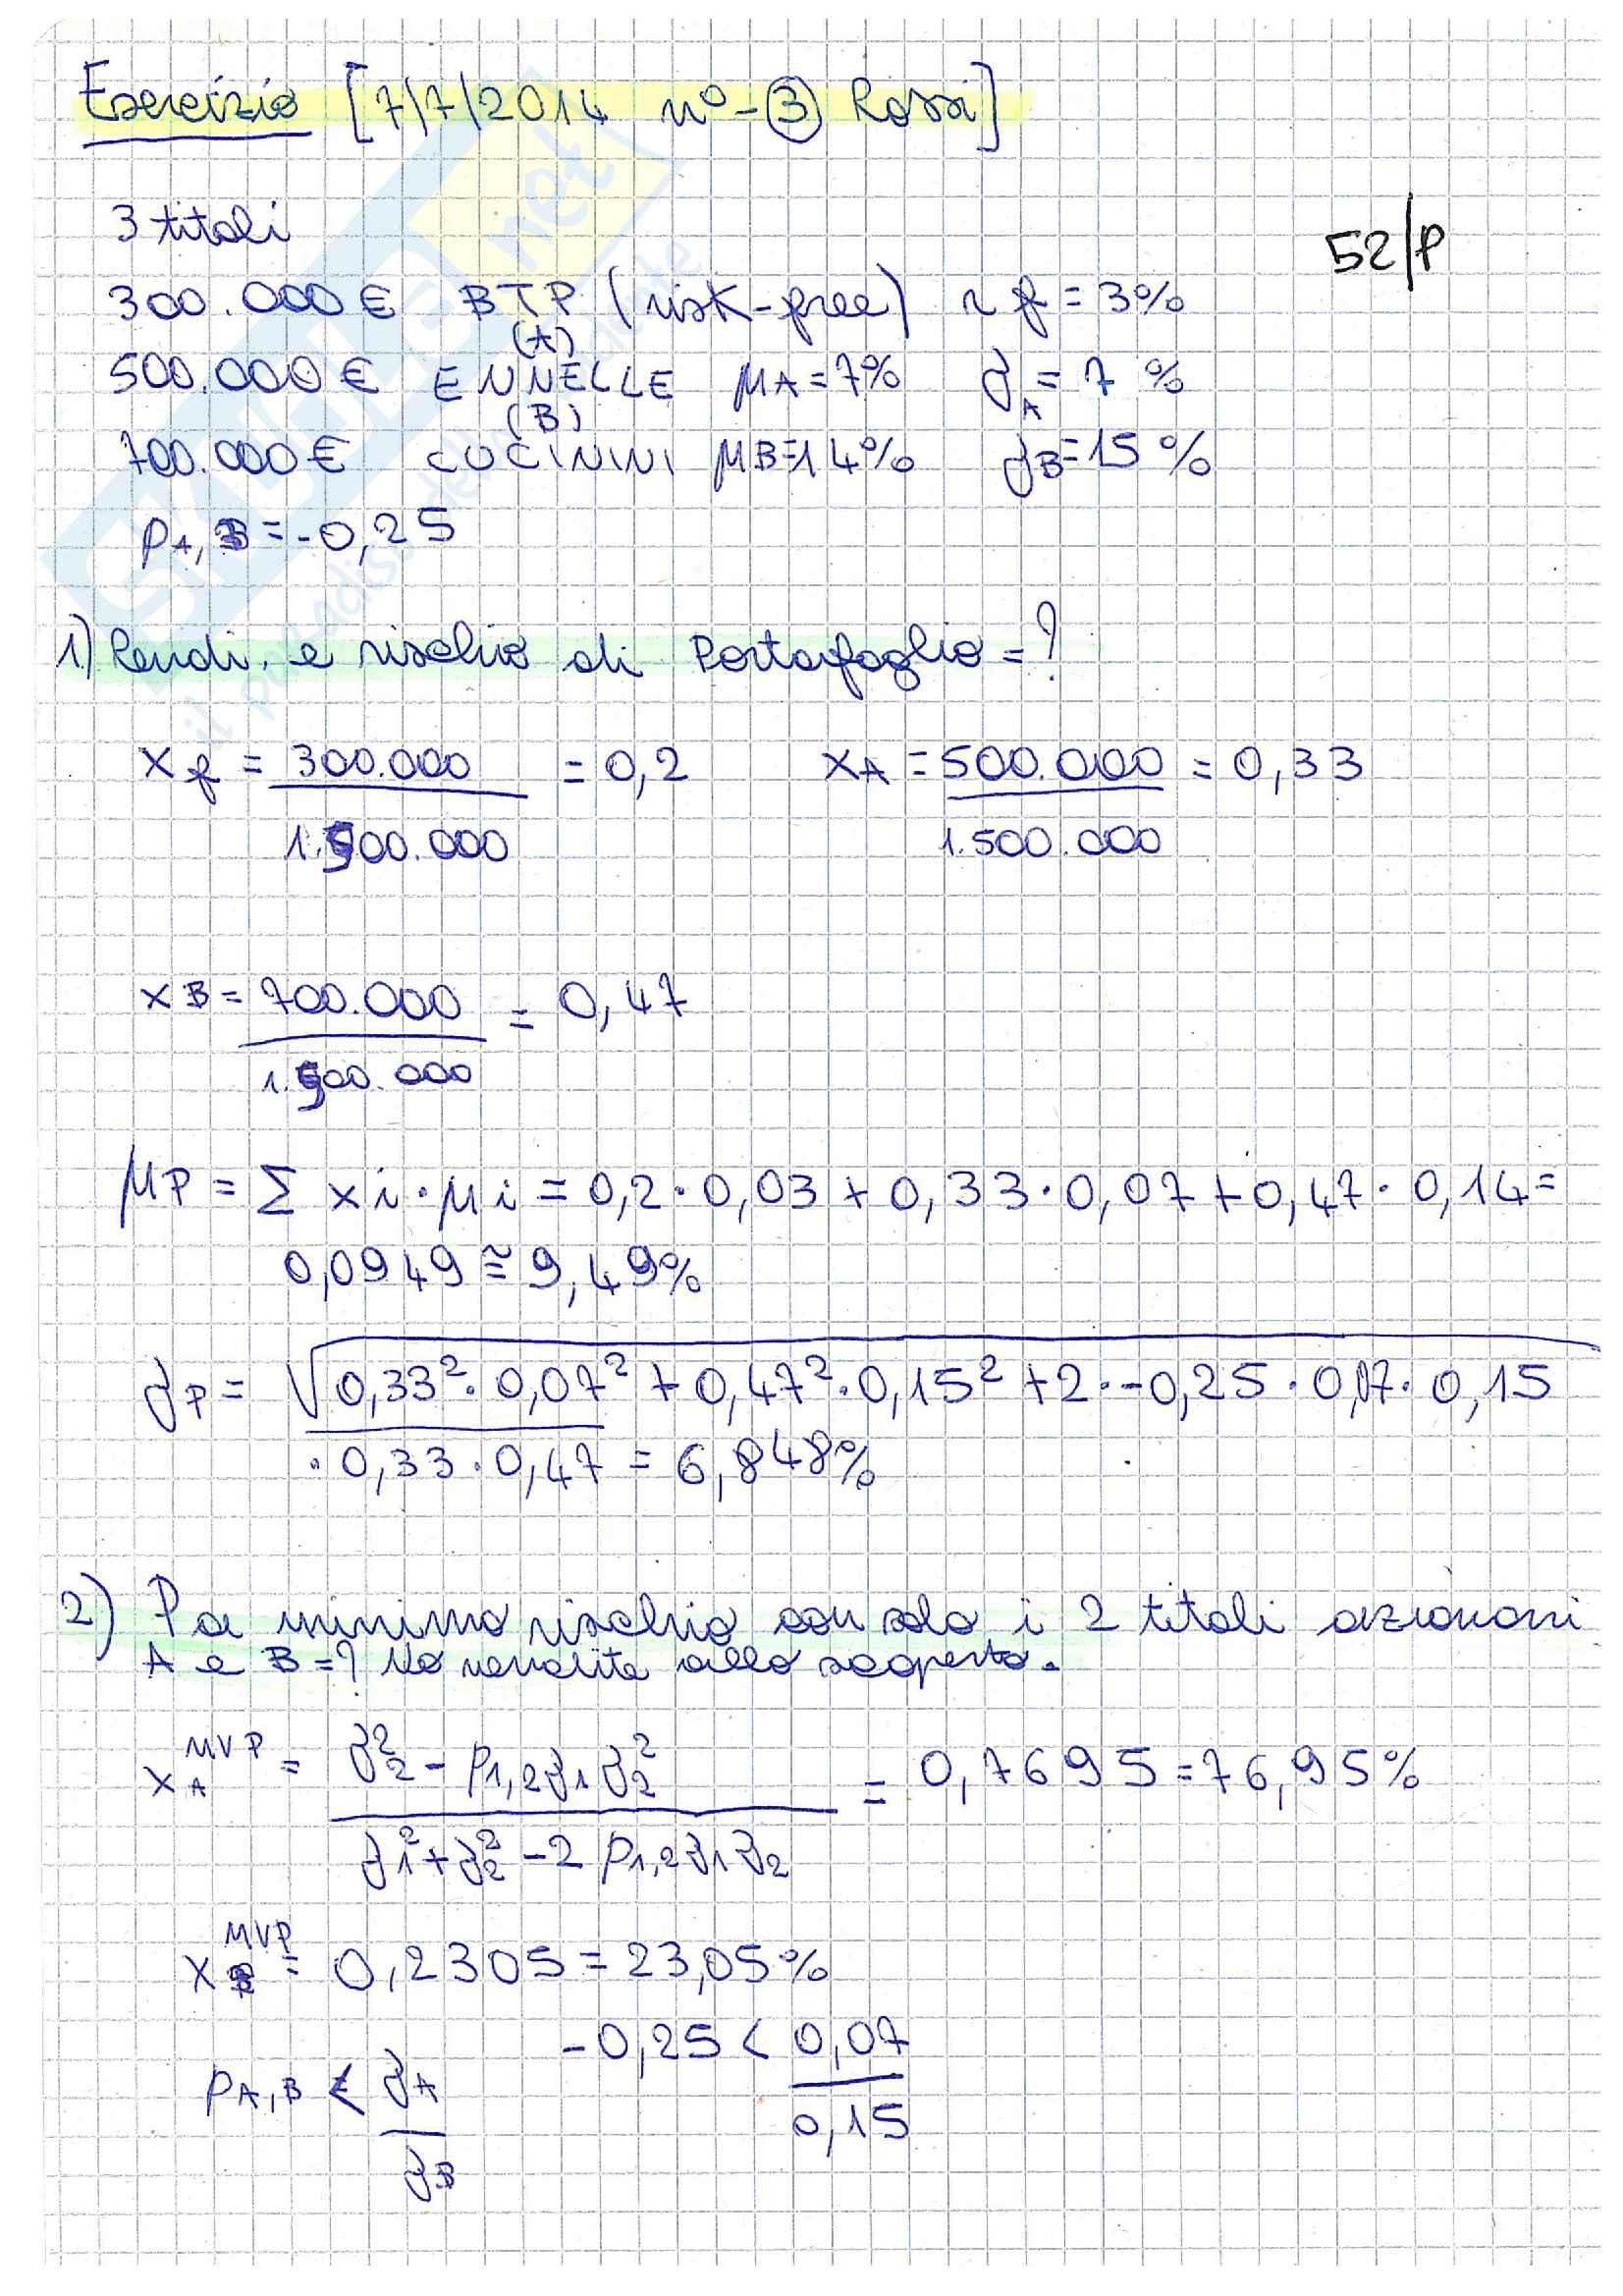 Matematica finanziaria 3 Pari B Pag. 6